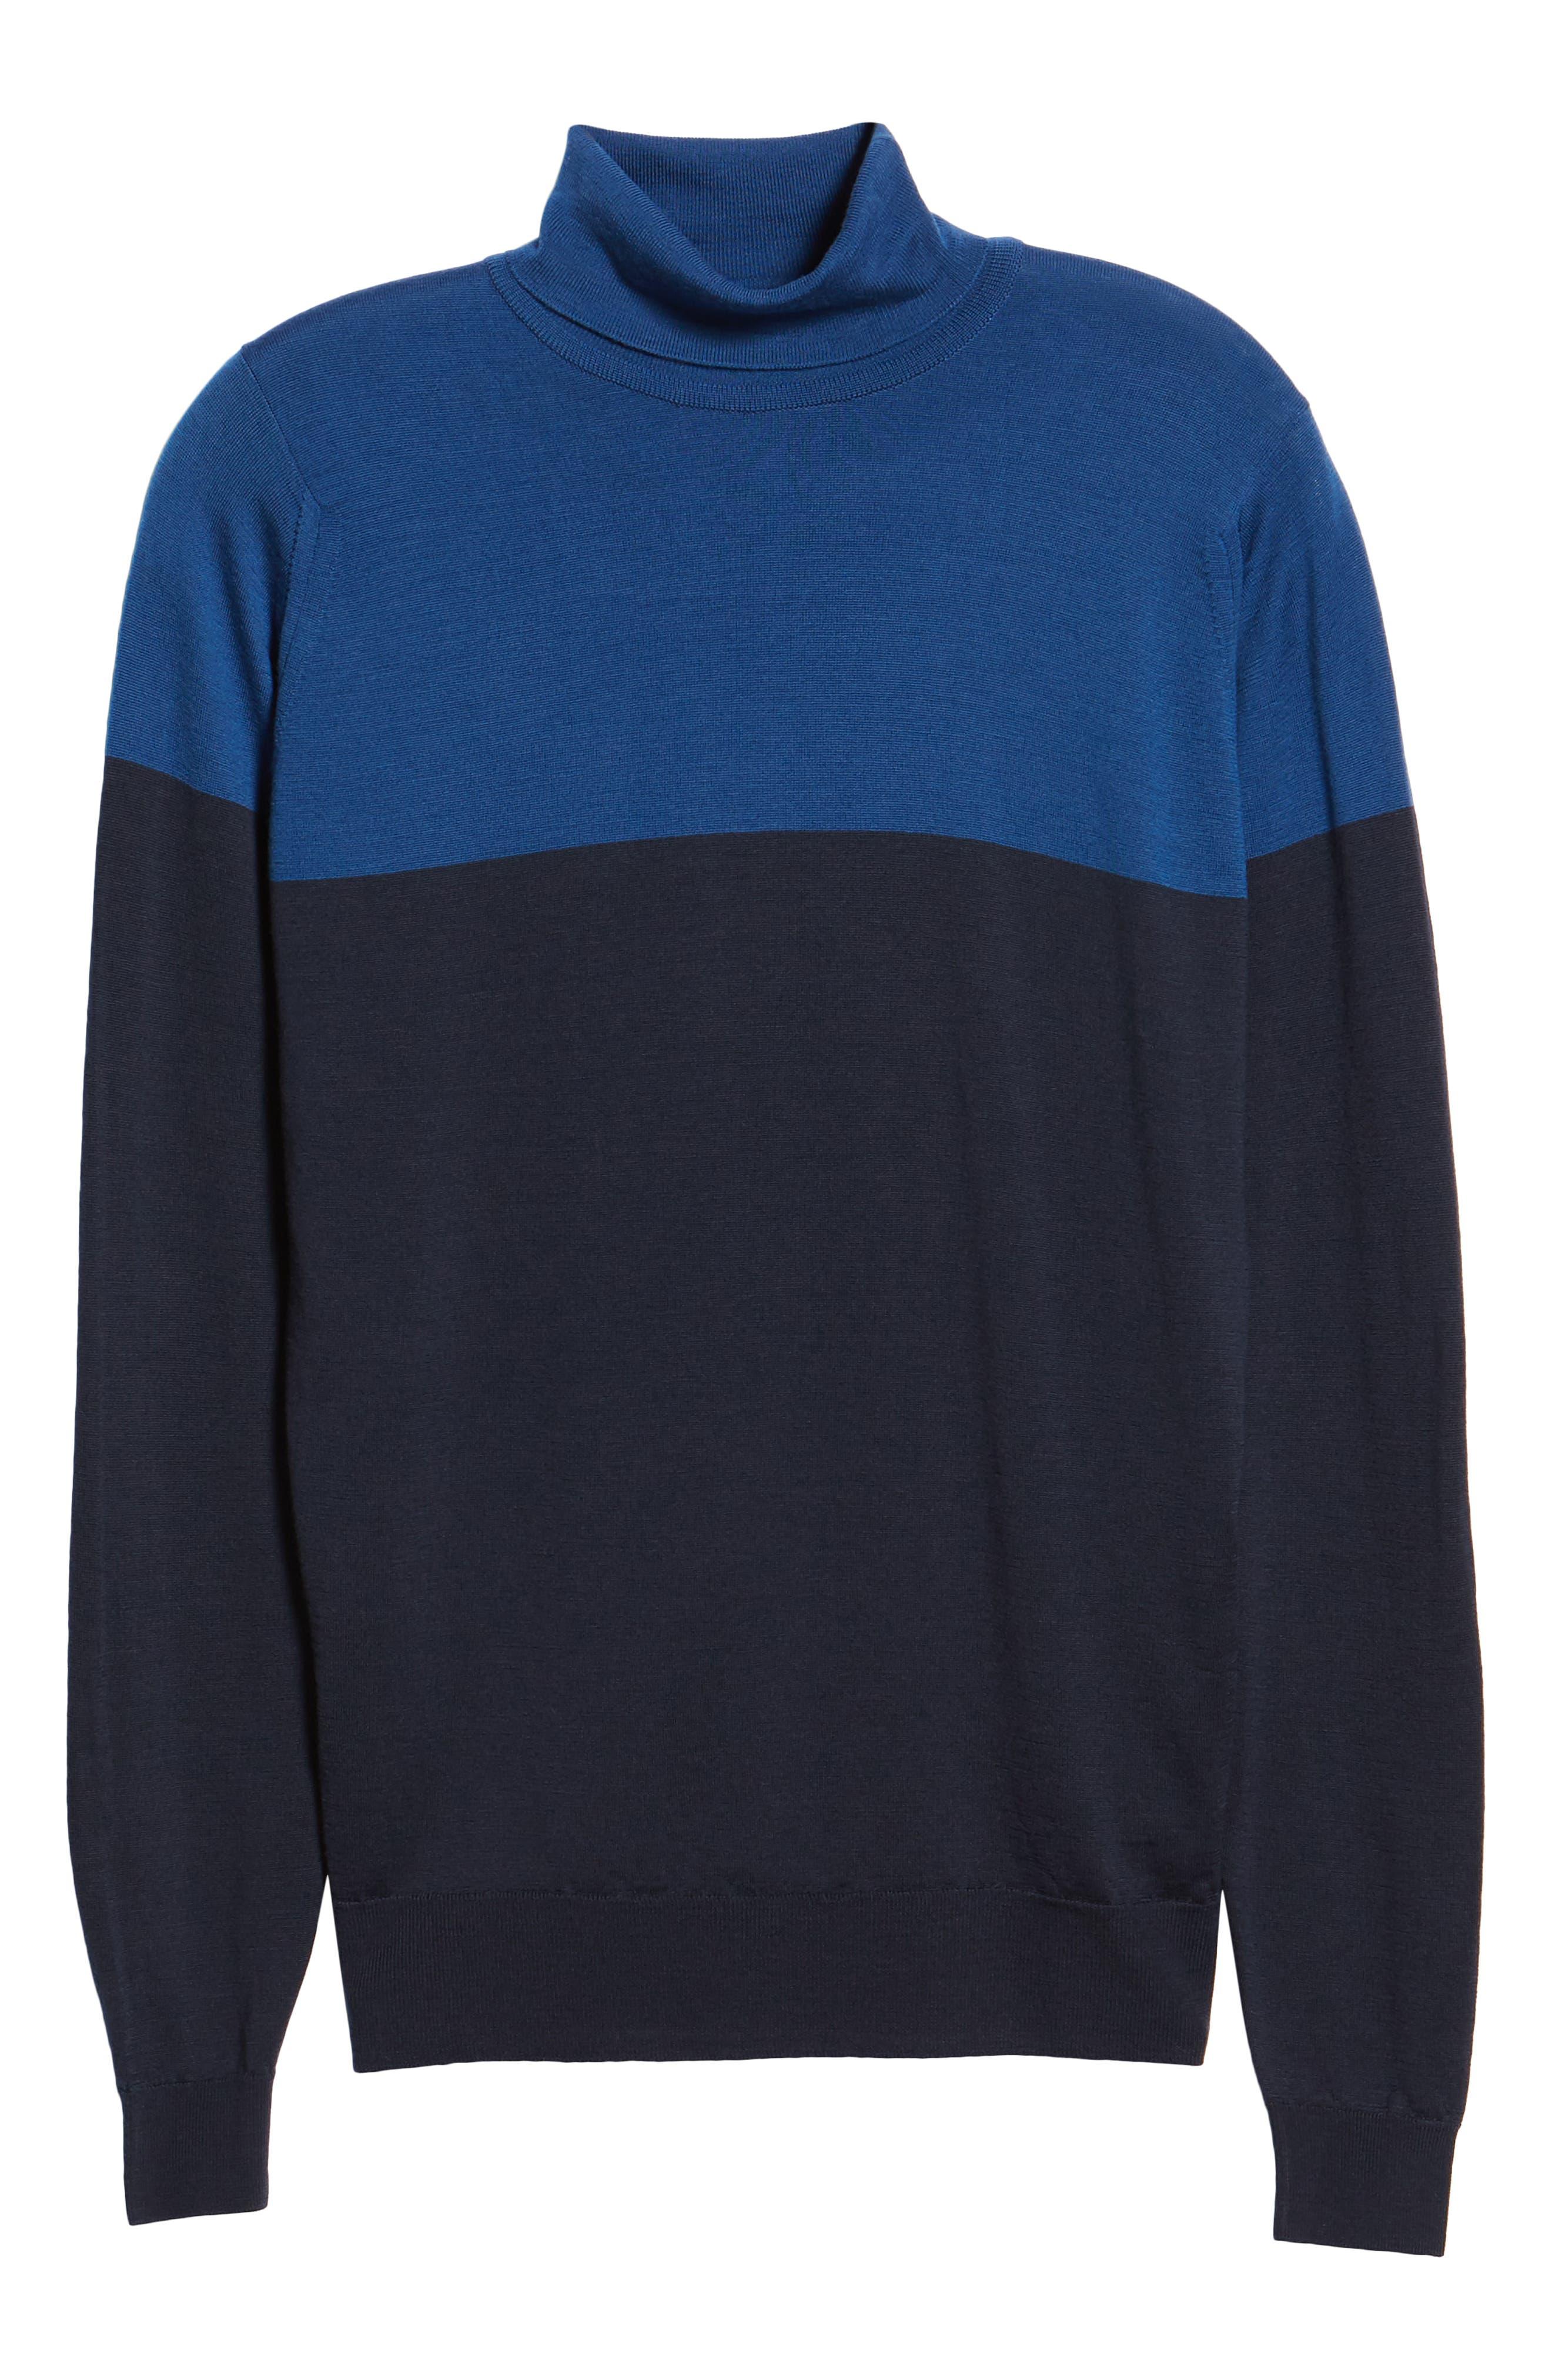 Slim Fit Colorblock Merino Wool Turtleneck Sweater,                             Alternate thumbnail 6, color,                             MIDNIGHT